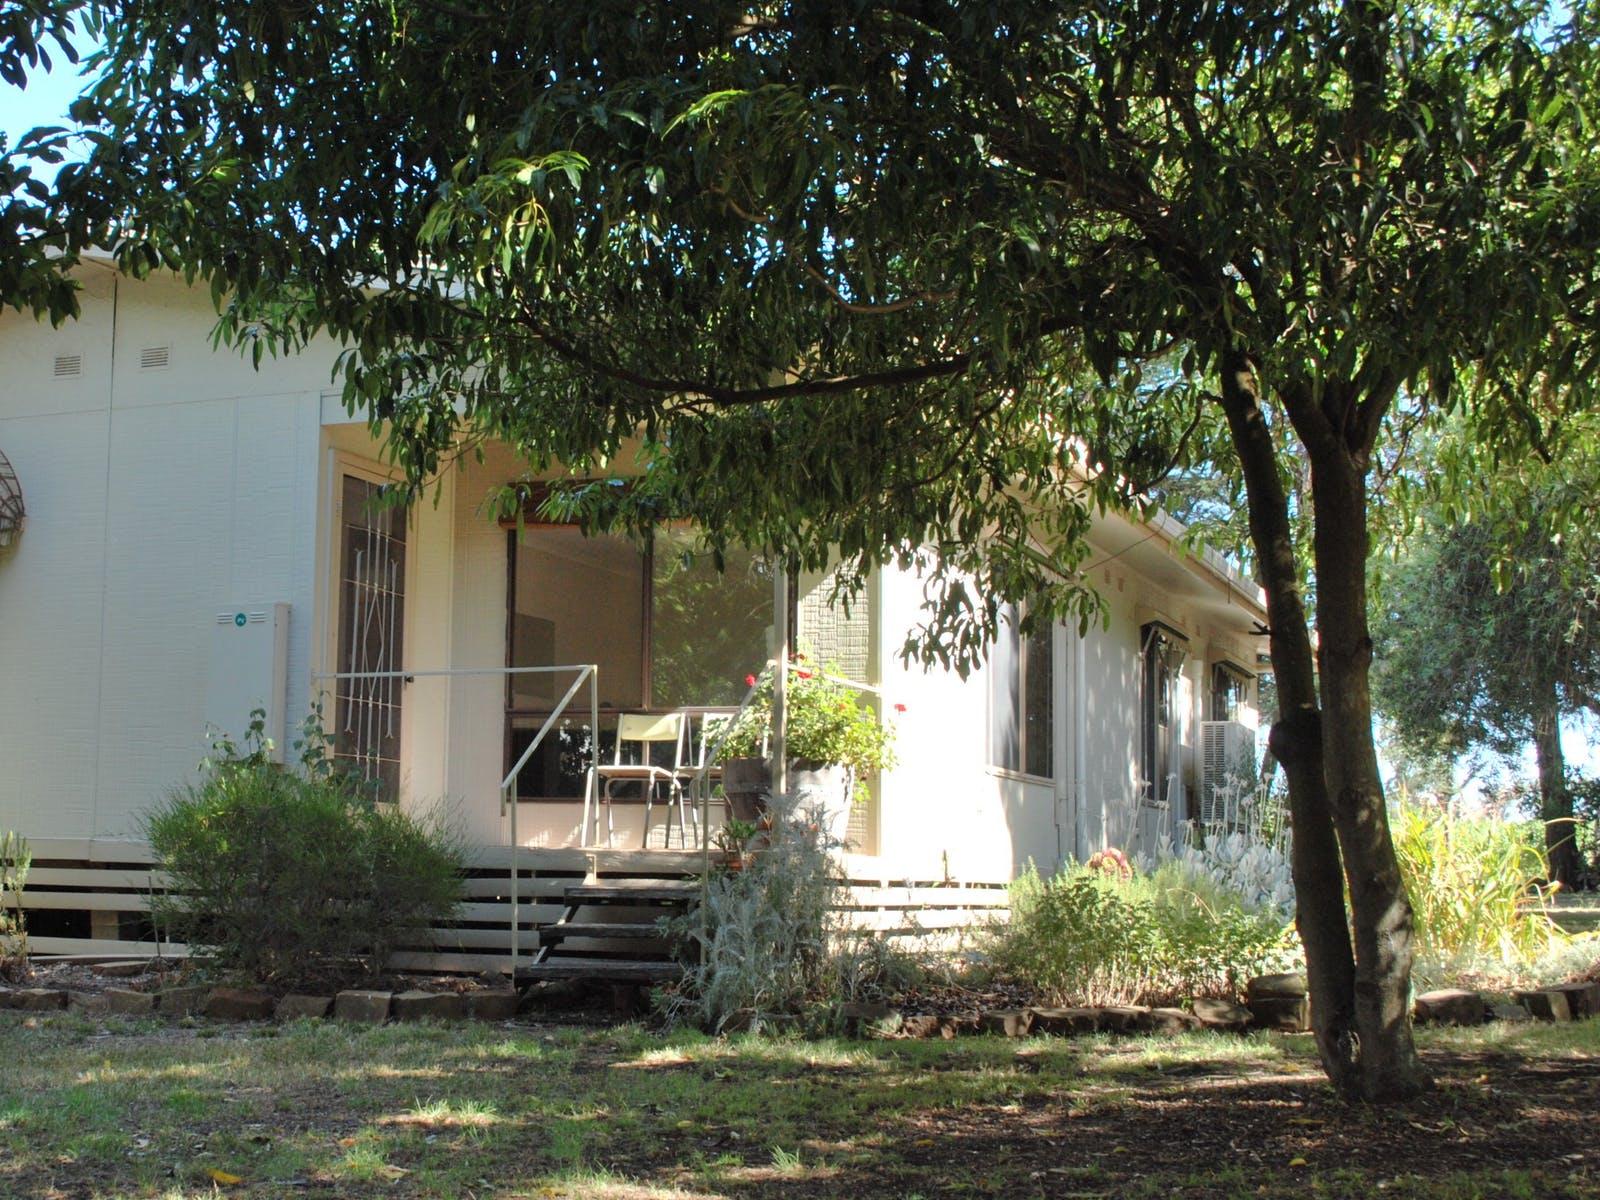 Rowanston B&B and garden